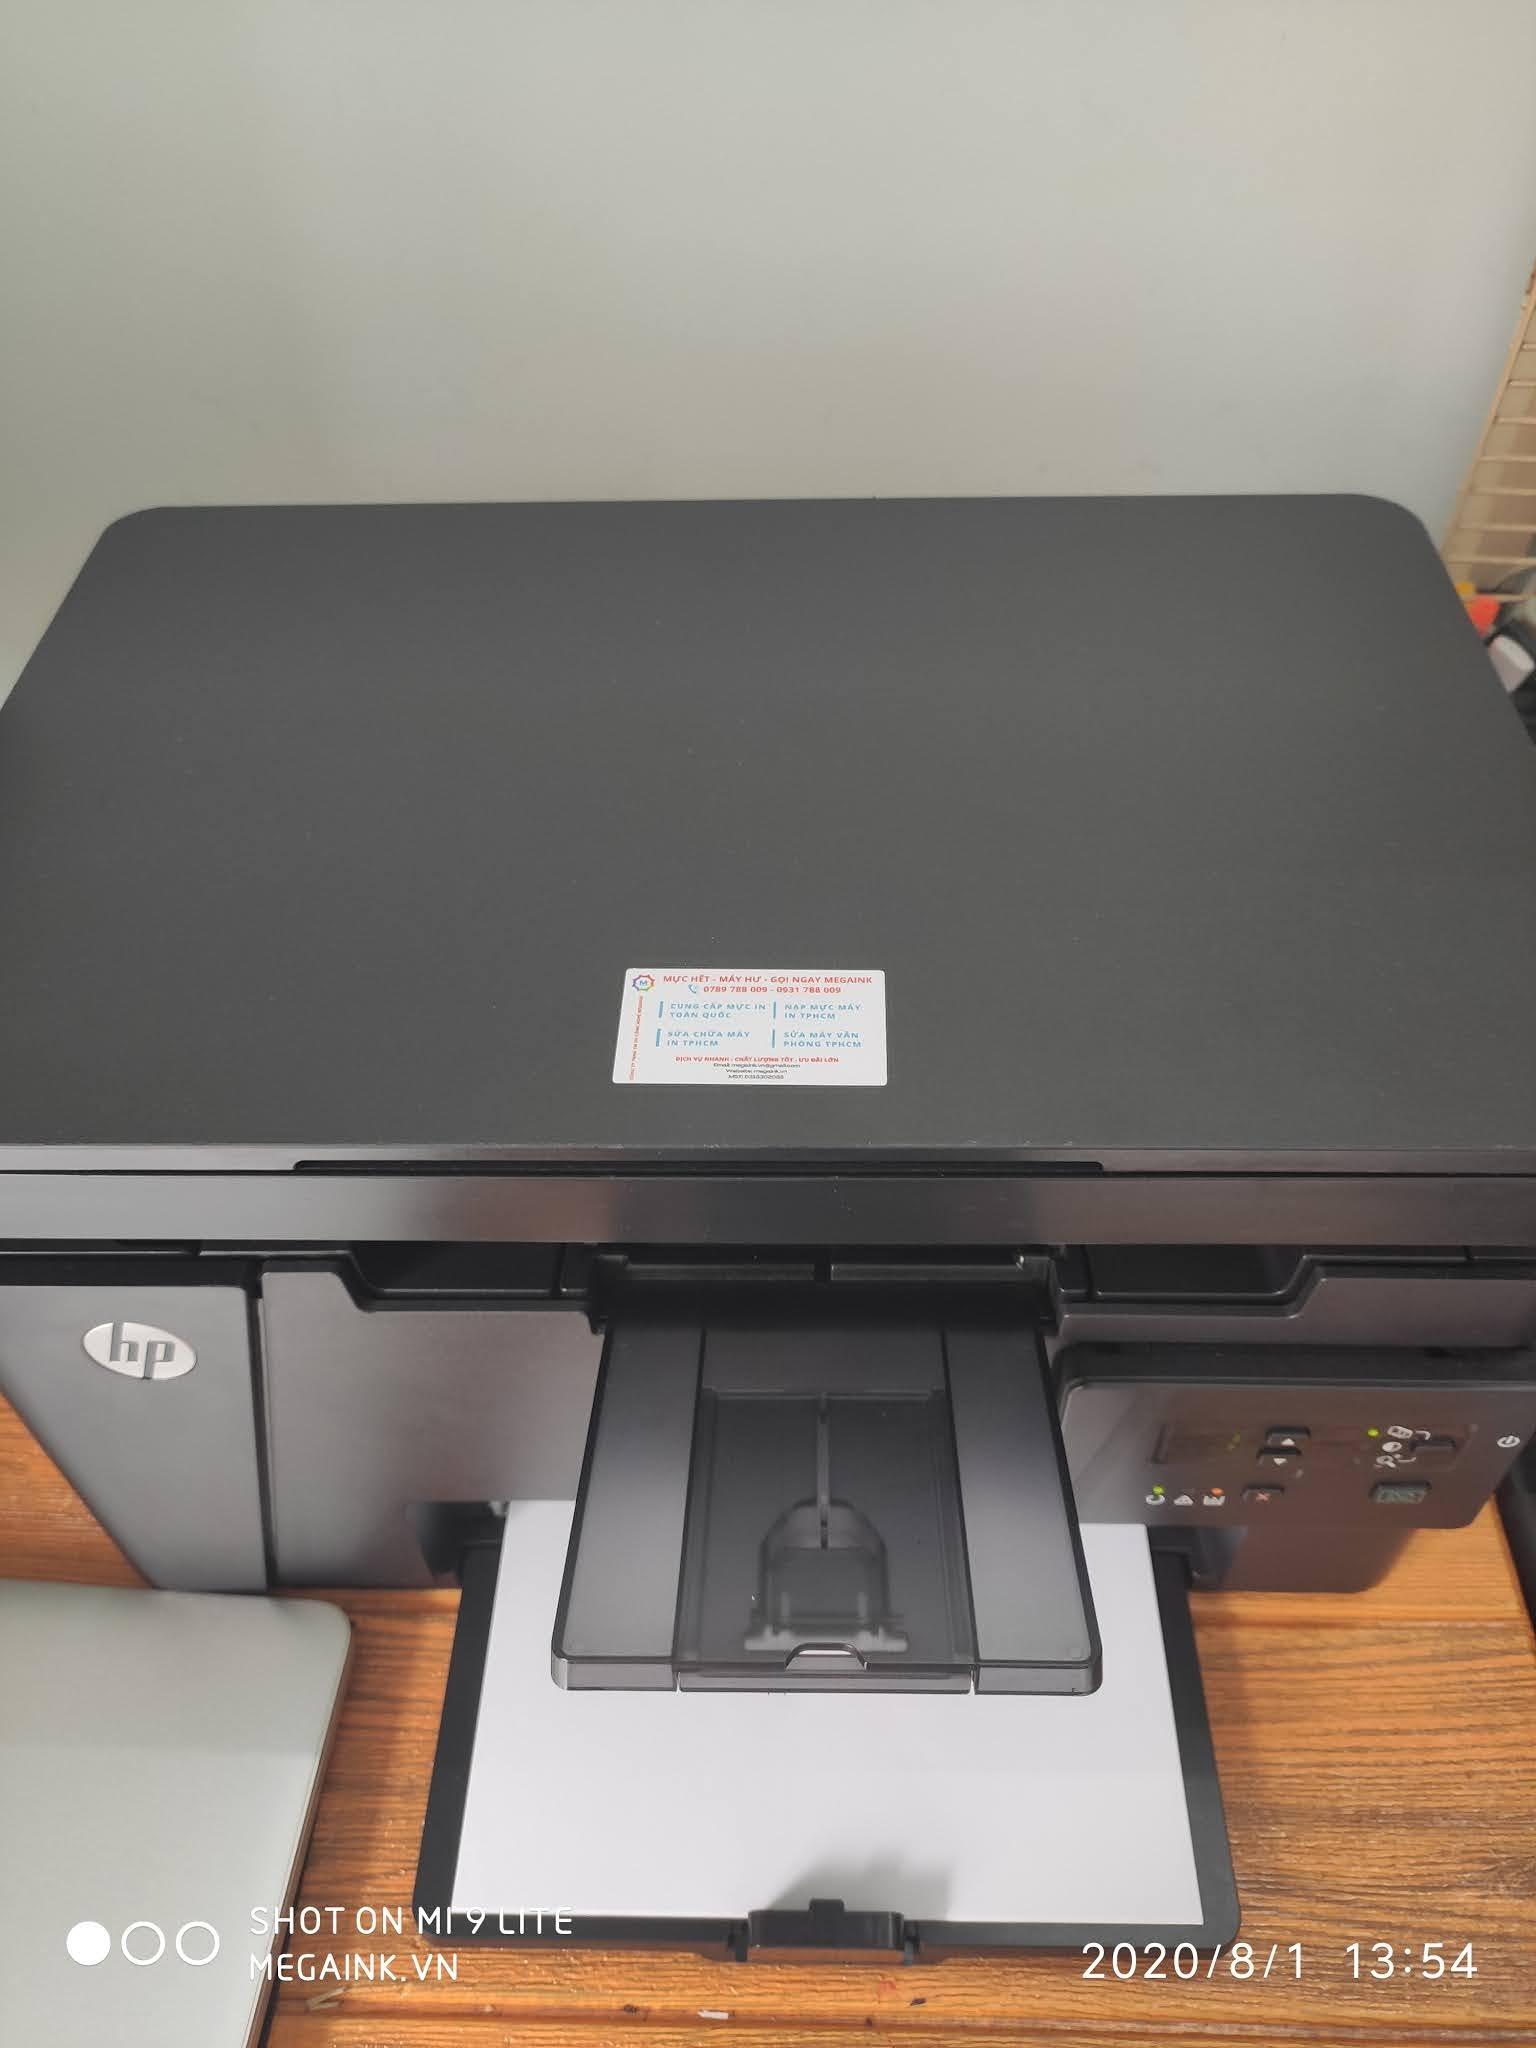 Thanh lý máy in HP M125A đa năng all in one In, Scan, Copy